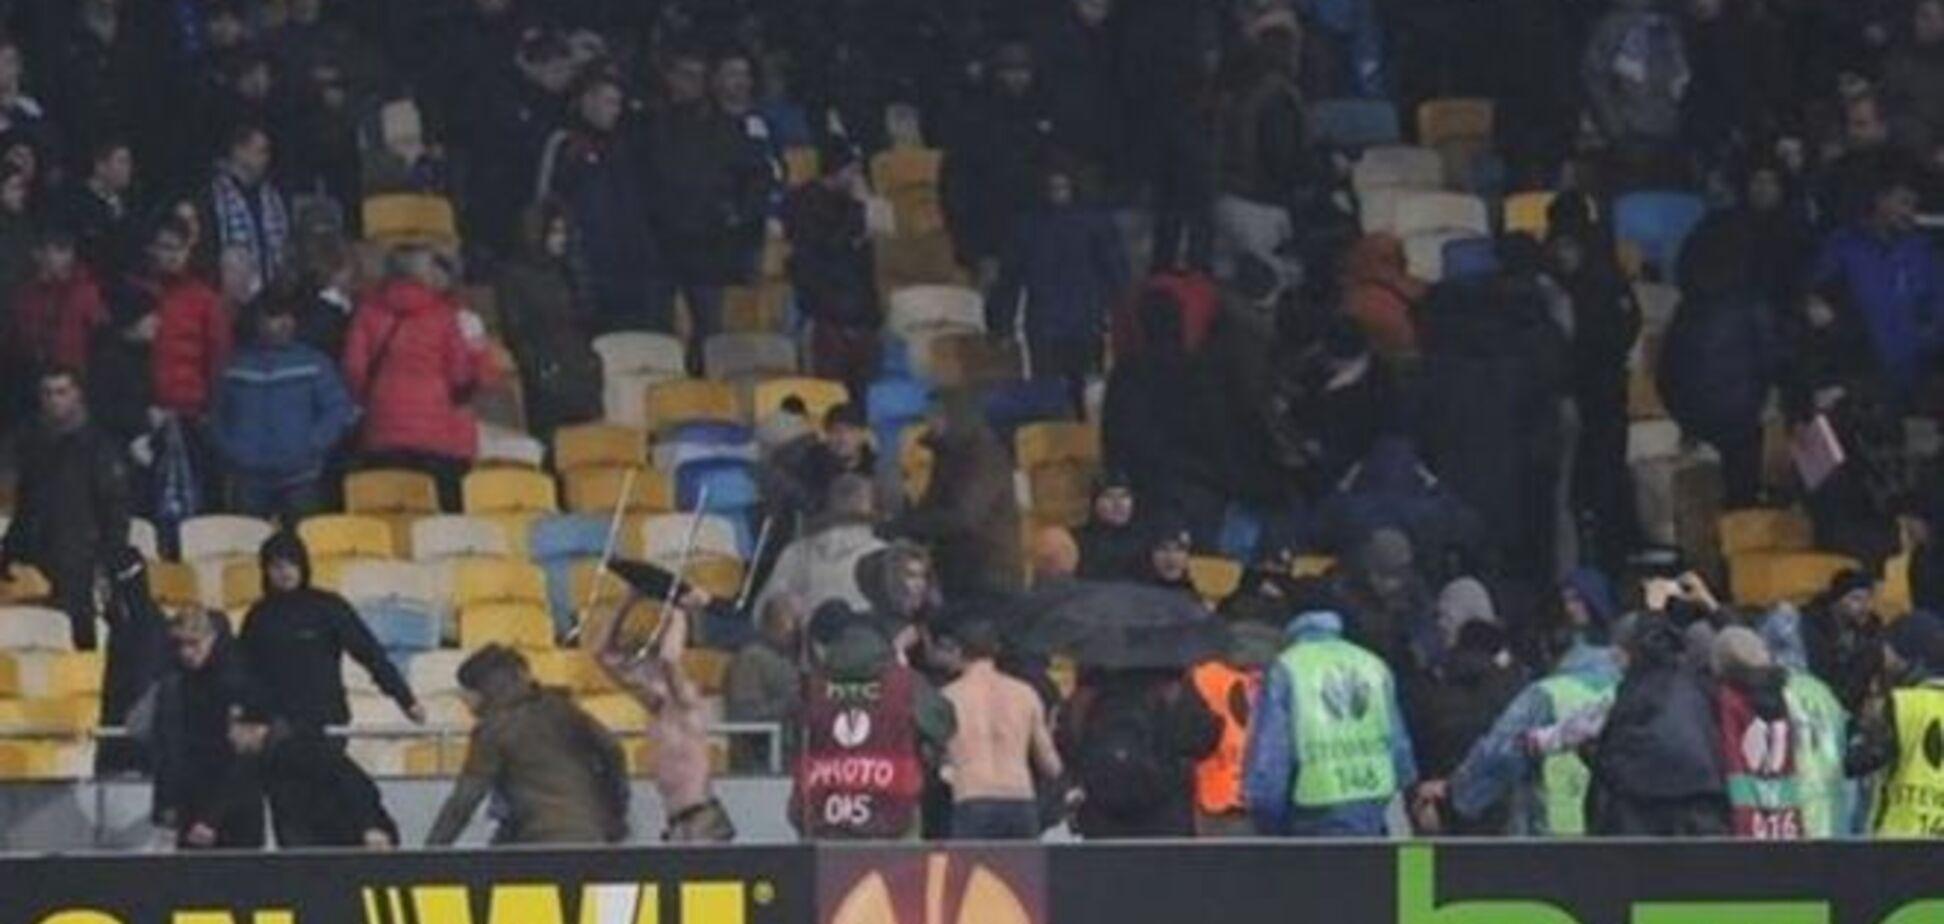 Стала известна причина беспорядков фанатов на матче Динамо - Генгам